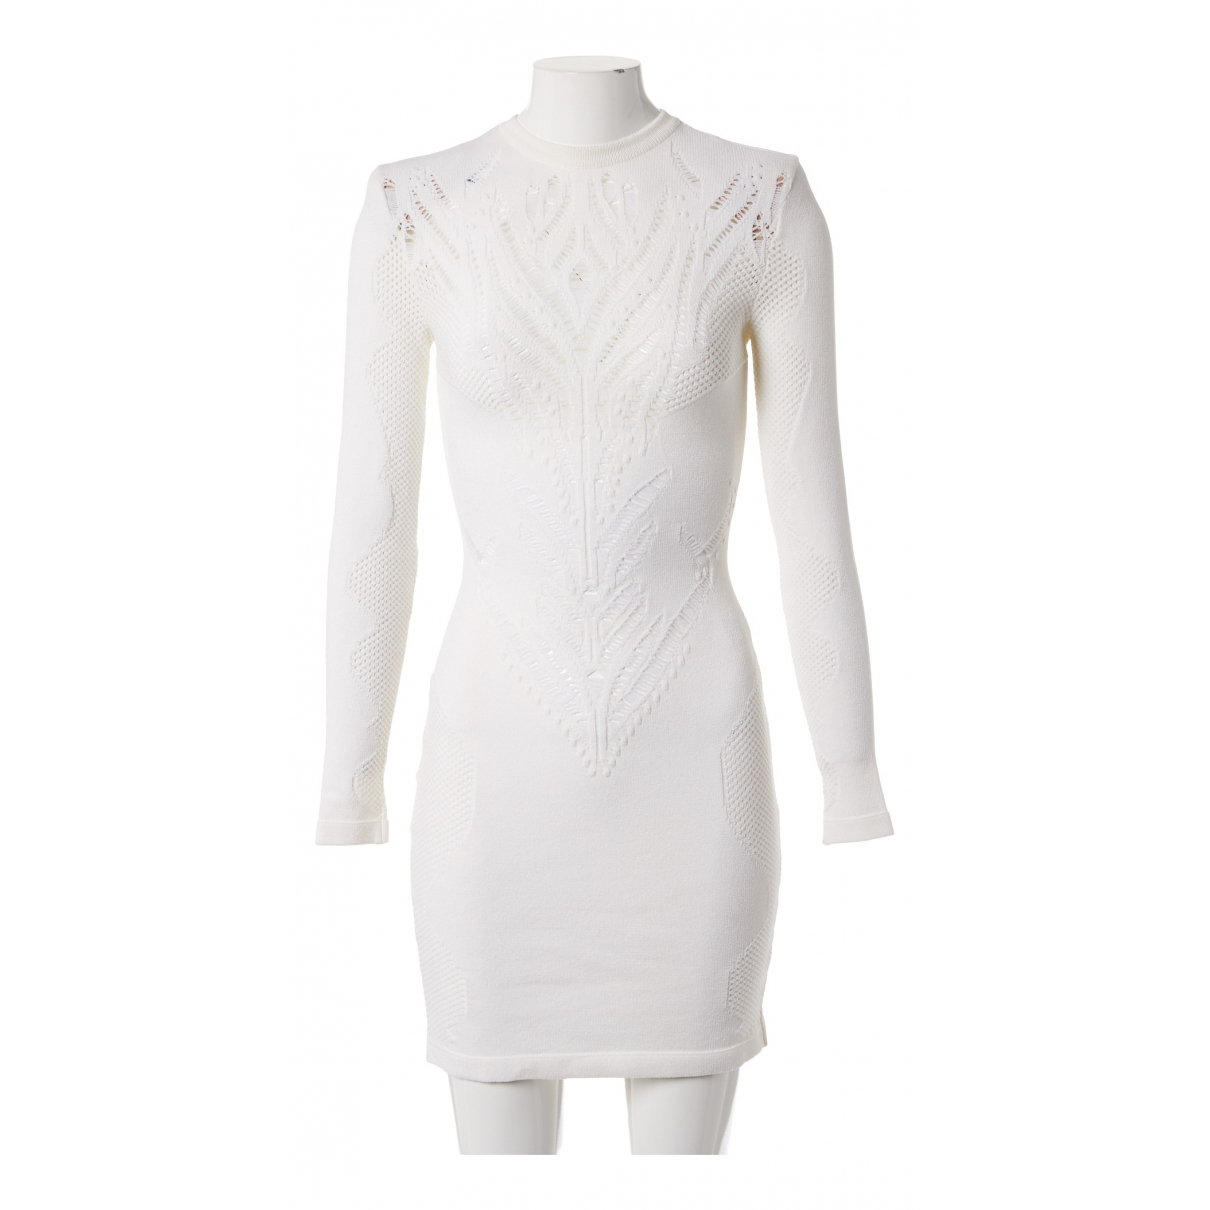 Balmain N Ecru dress for Women 36 FR